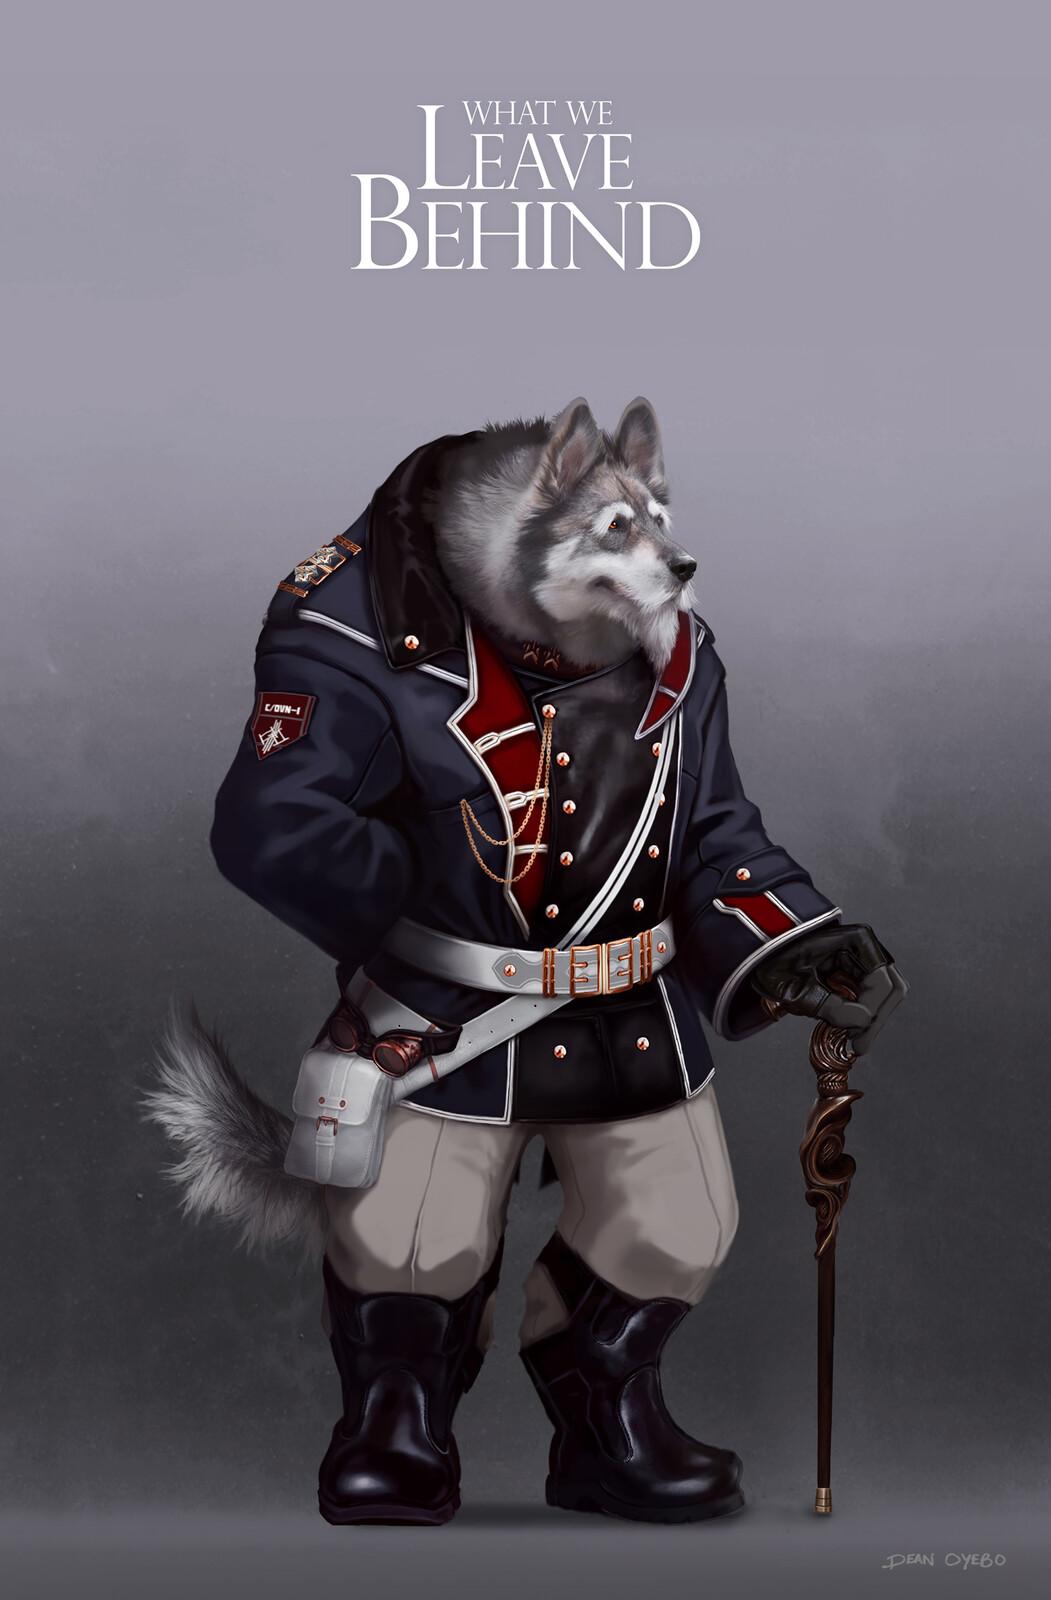 Commander Morris